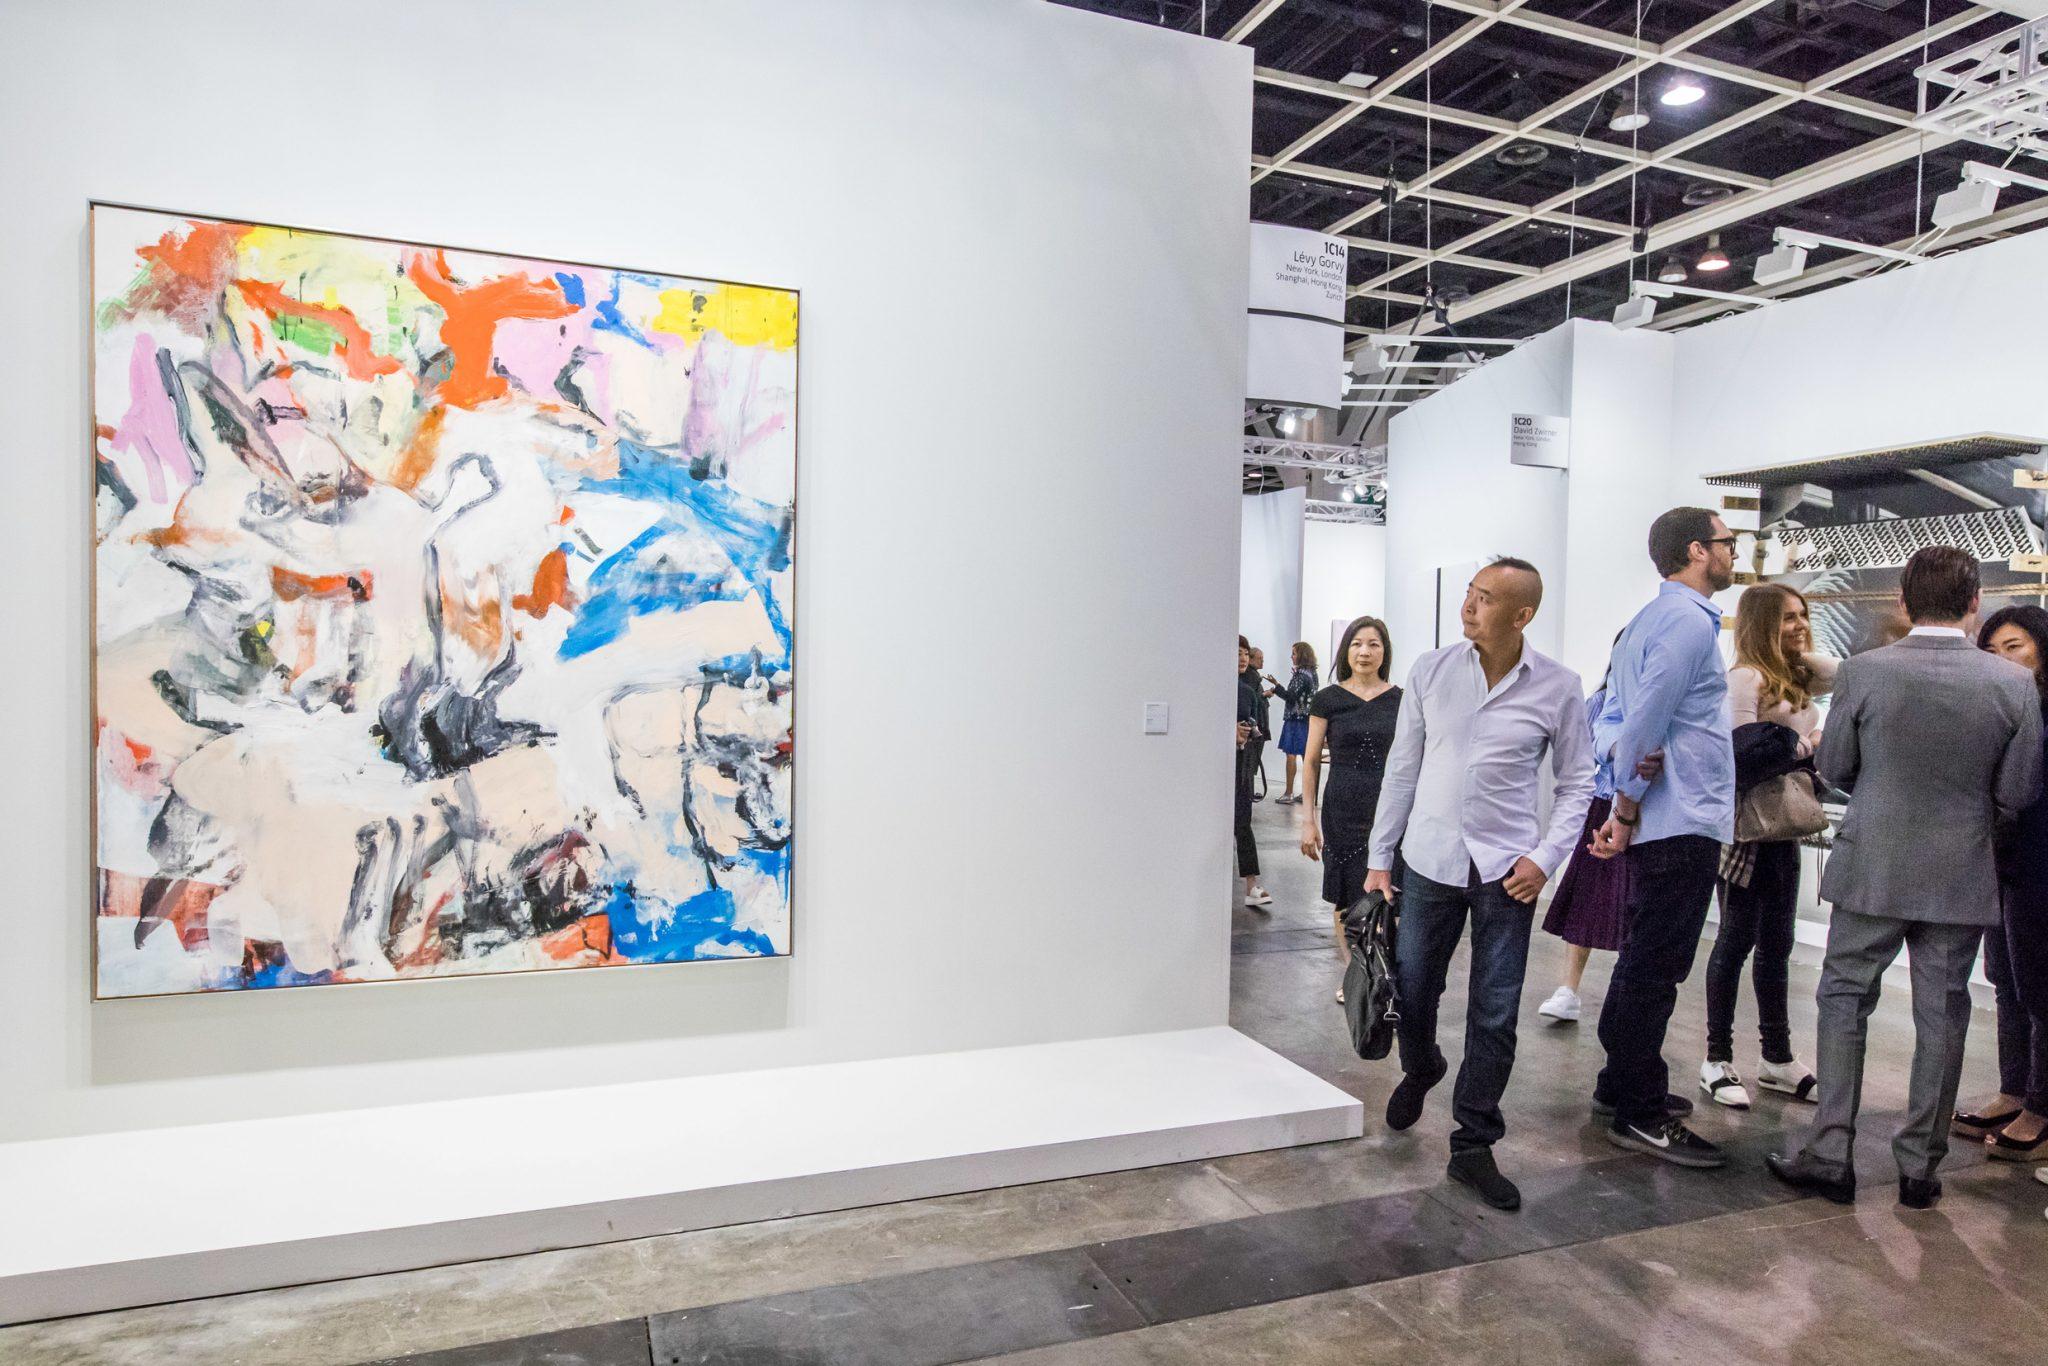 Il de Kooning da 35 milioni venduto in meno di due ore ad Art Basel Hong Kong